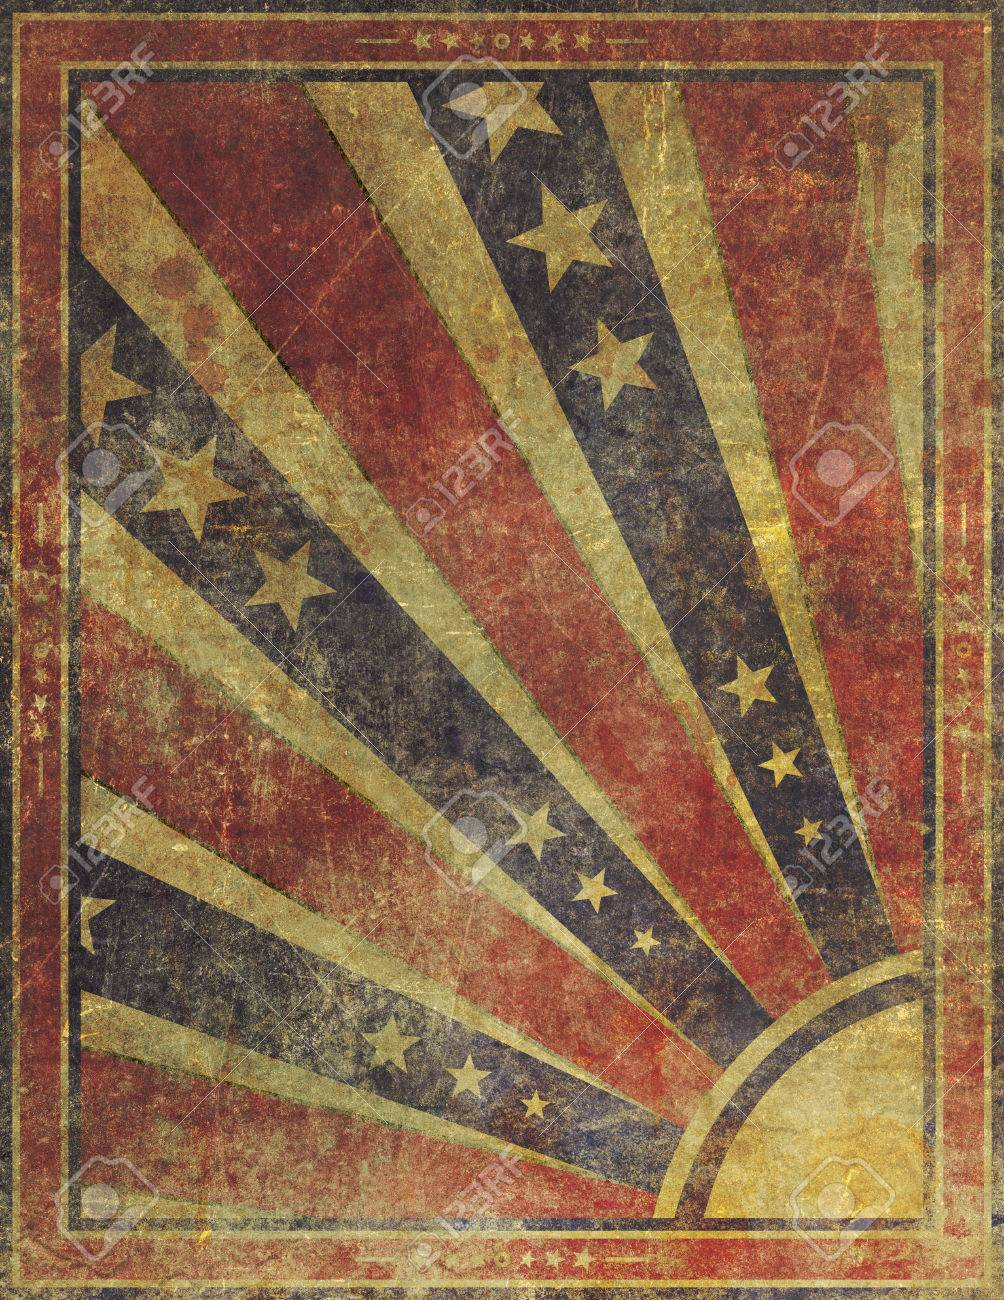 Old worn grunge paper background Stock Photo, Royalty Free Image ...